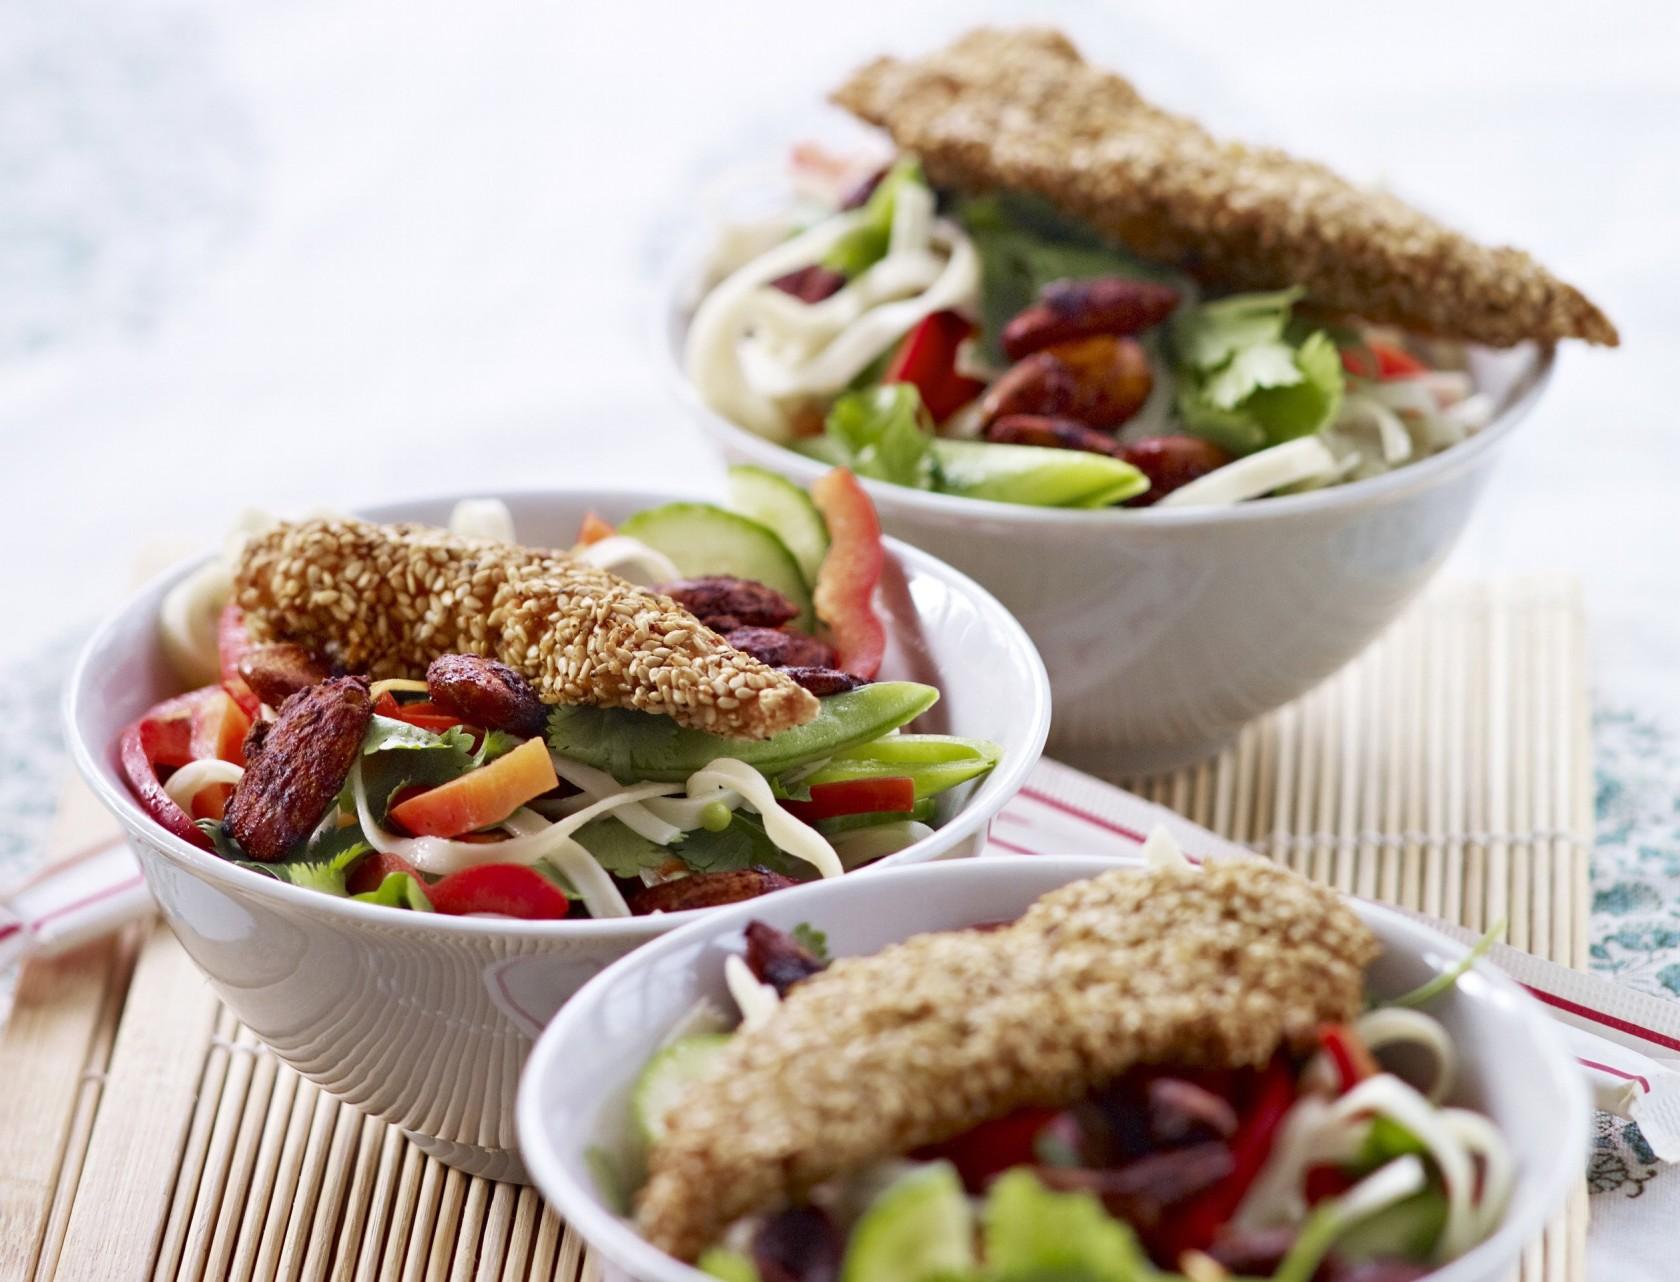 Nudelsalat med sesamstegt kylling og sojamandler